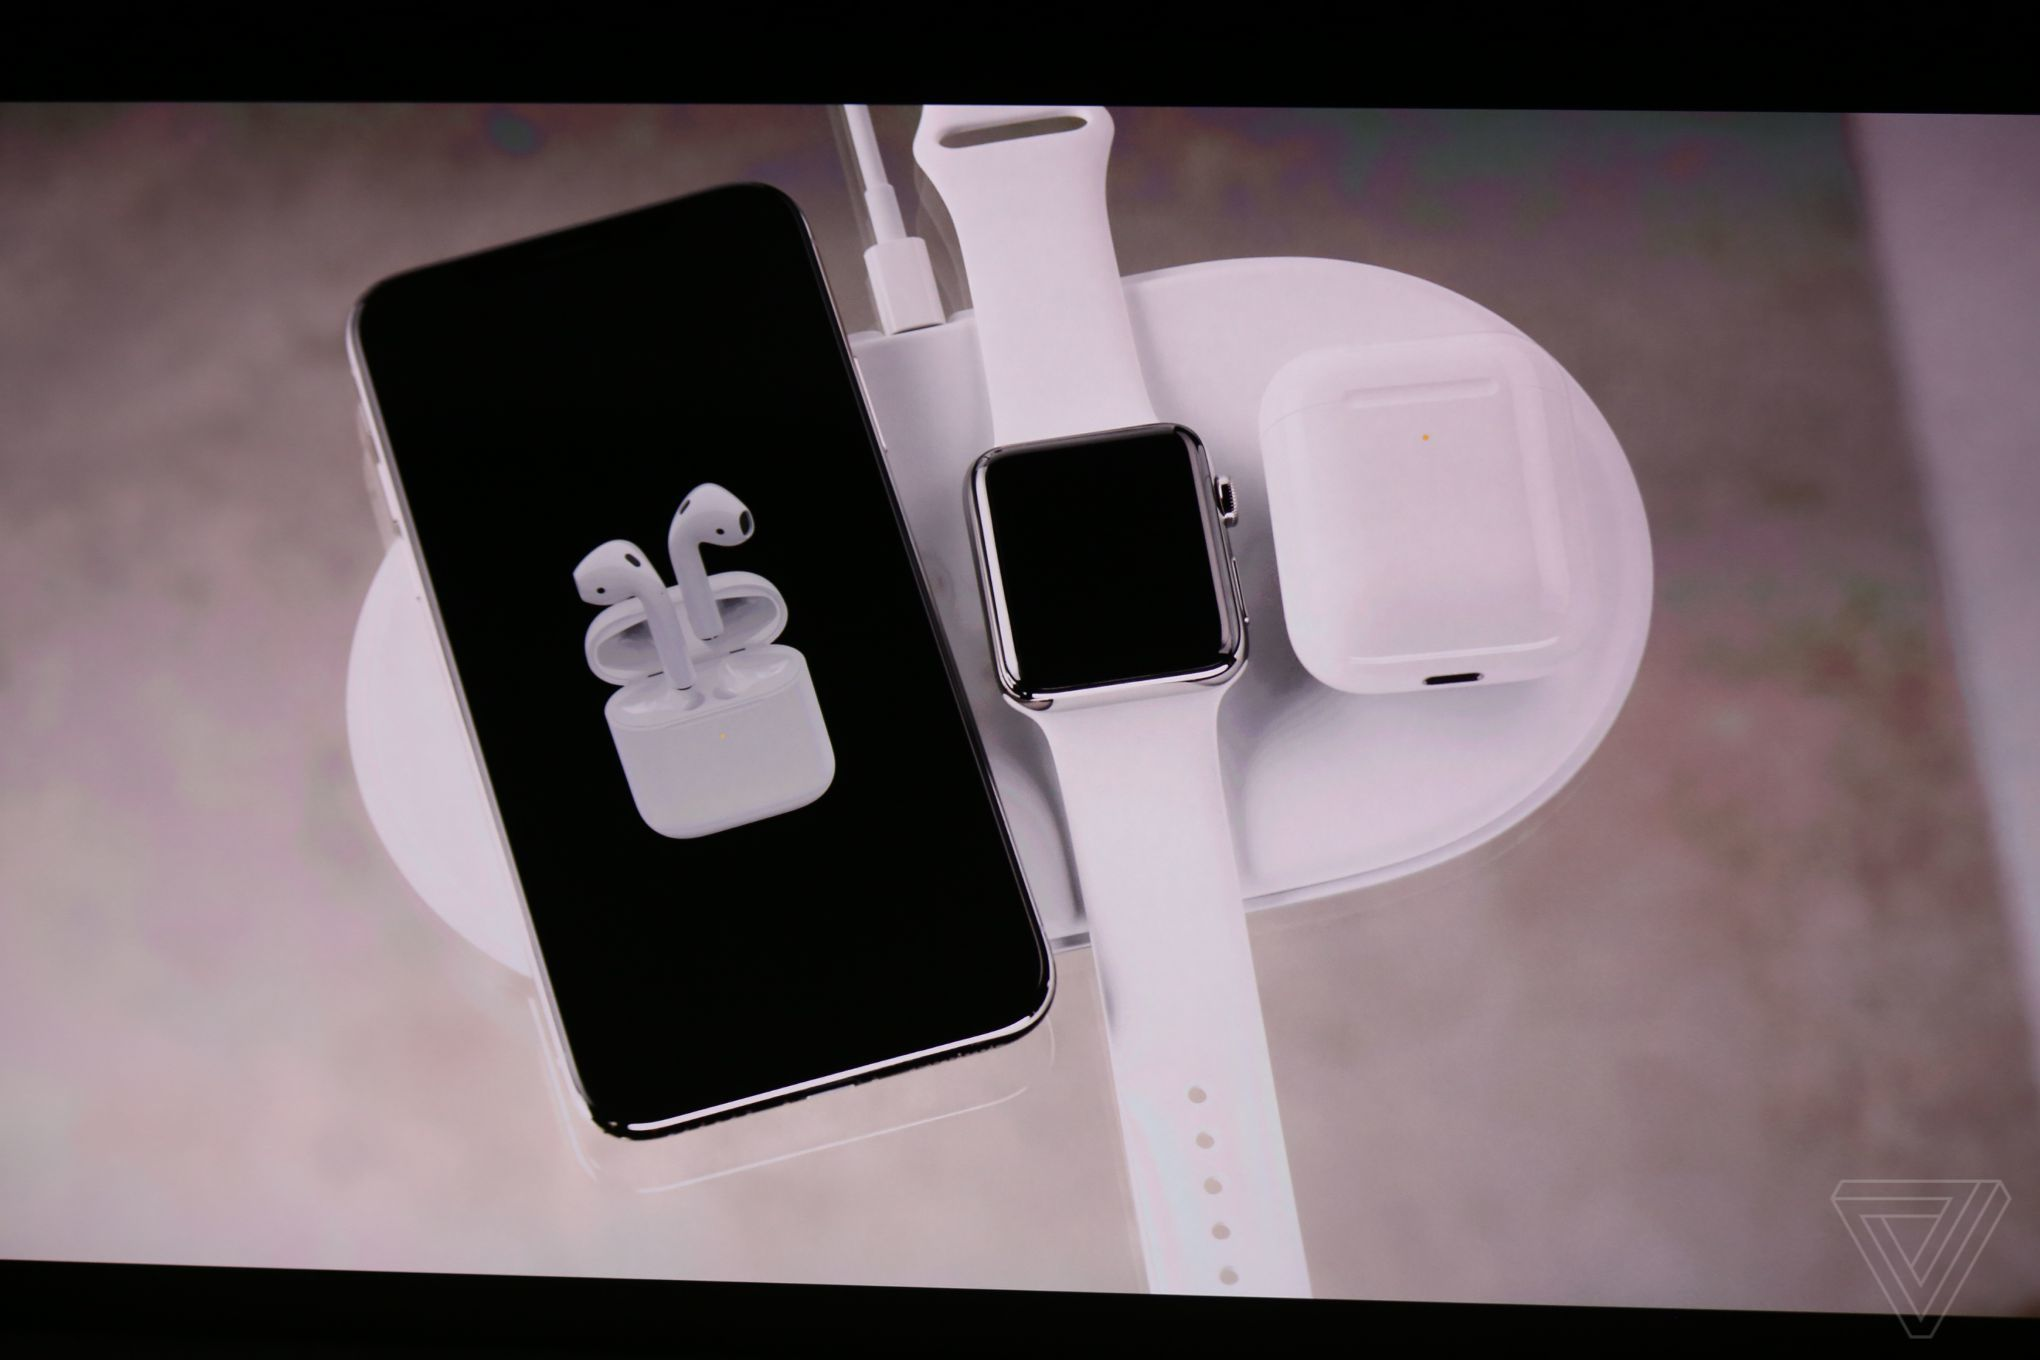 apple høretelefoner iphone 5